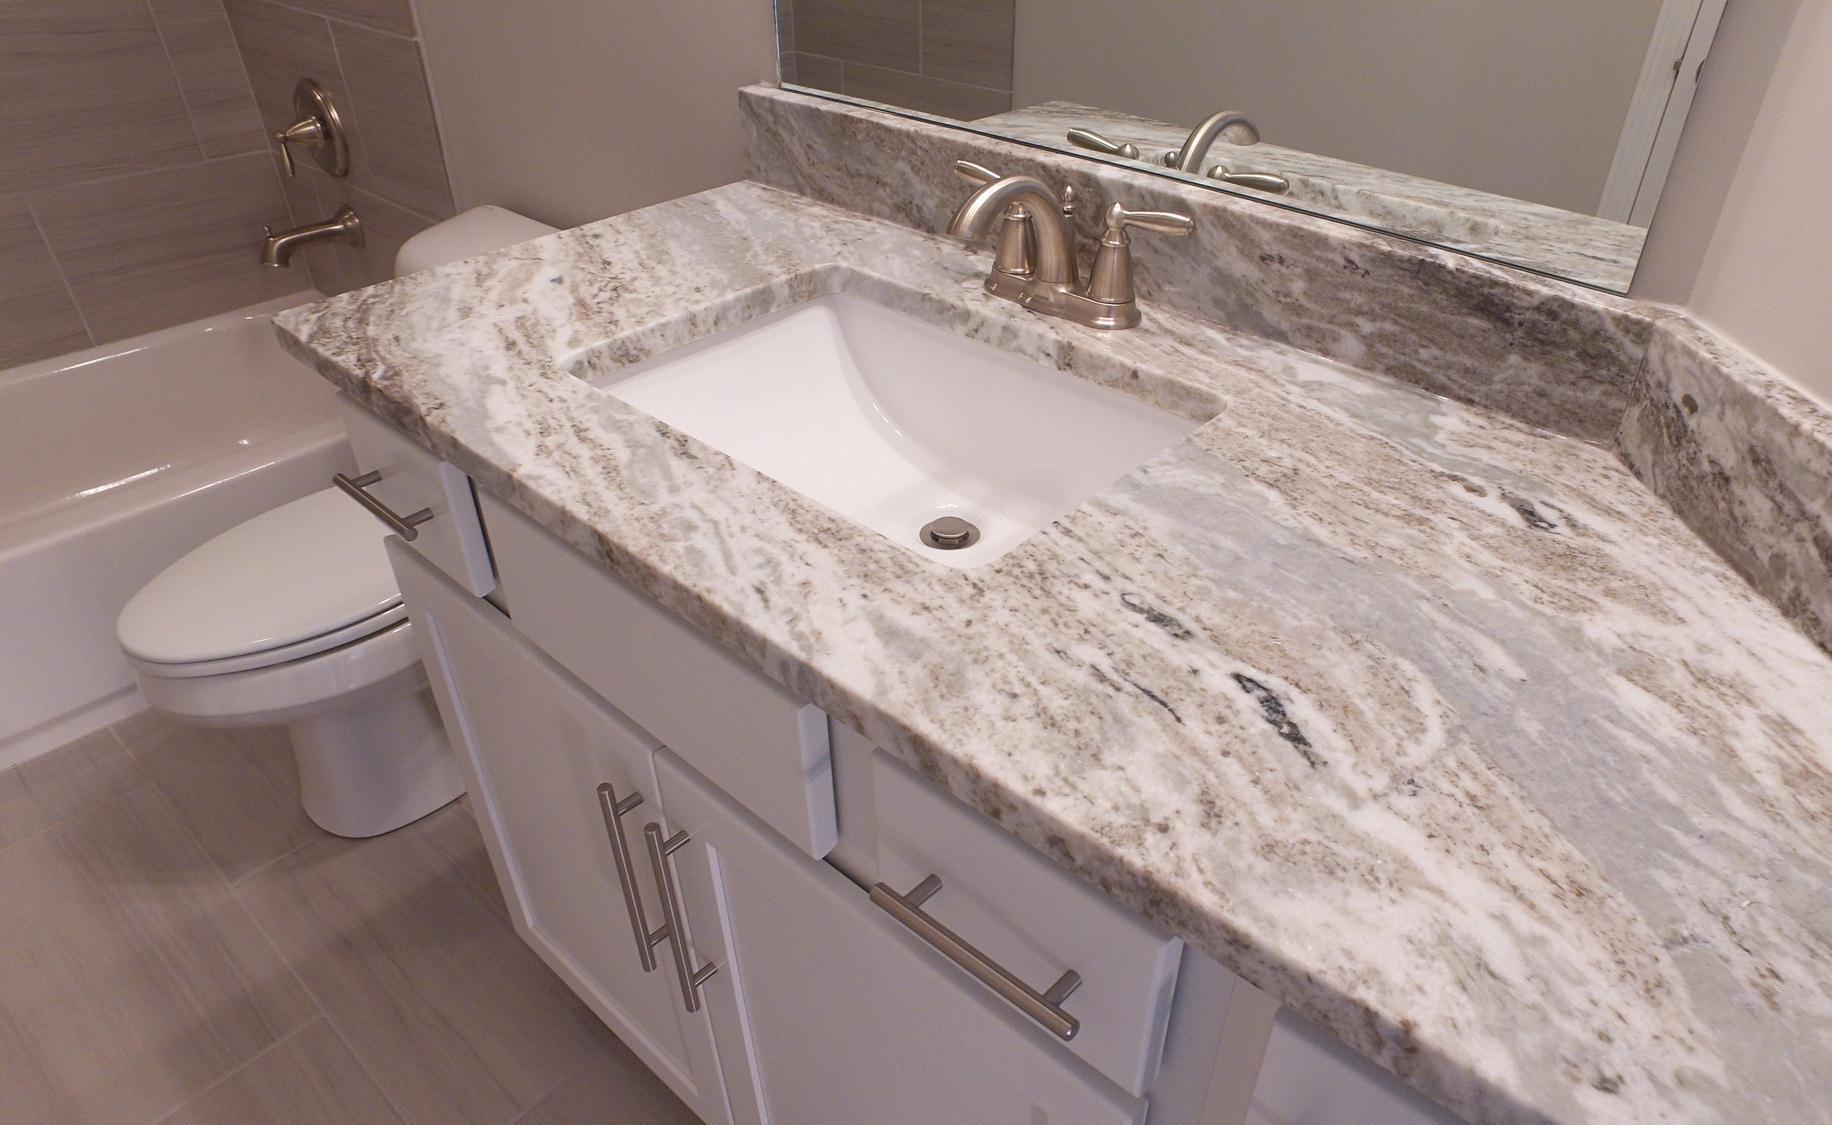 Bathroom featured in the Harper By Regency Homebuilders in Memphis, TN